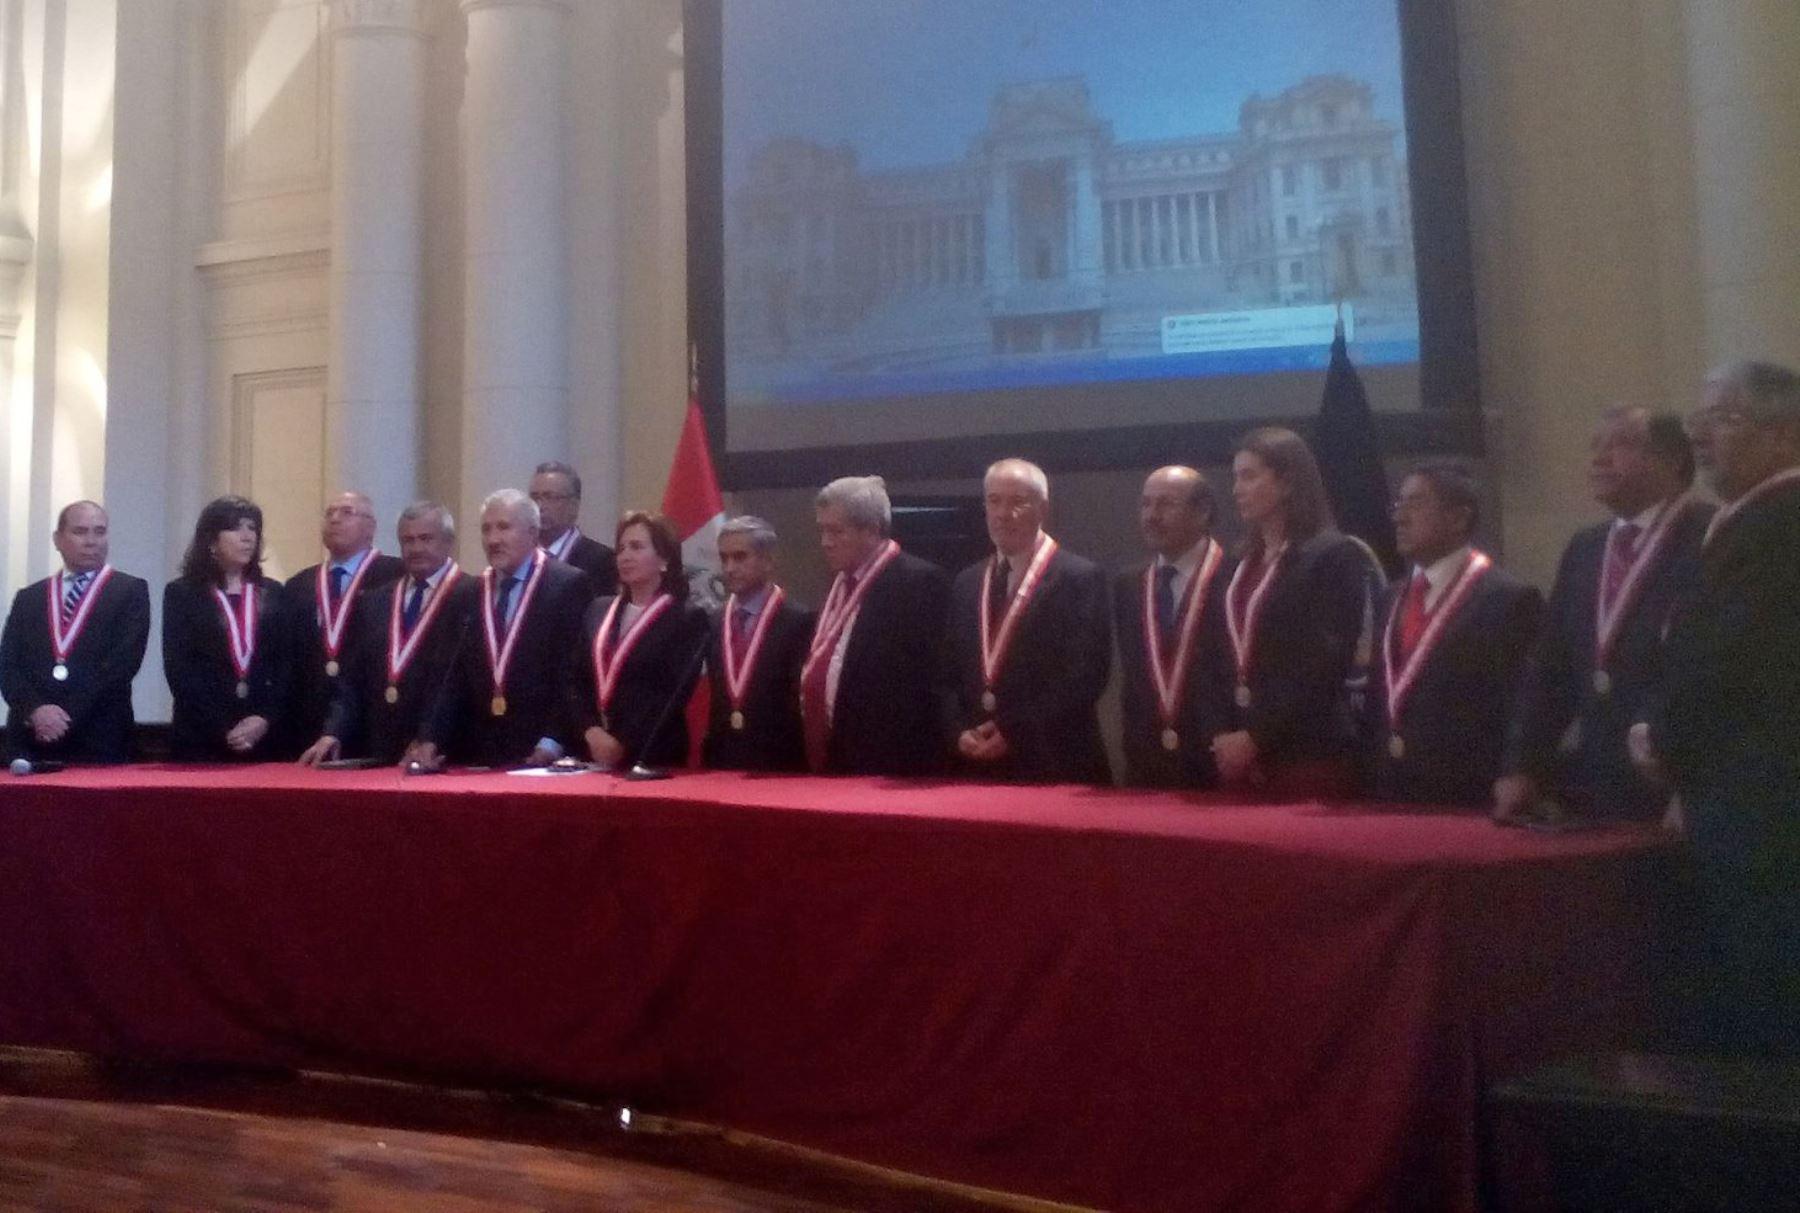 Juez Duberlí Rodríguez es el nuevo presidente del Poder Judicial. Foto: Poder Judicial.